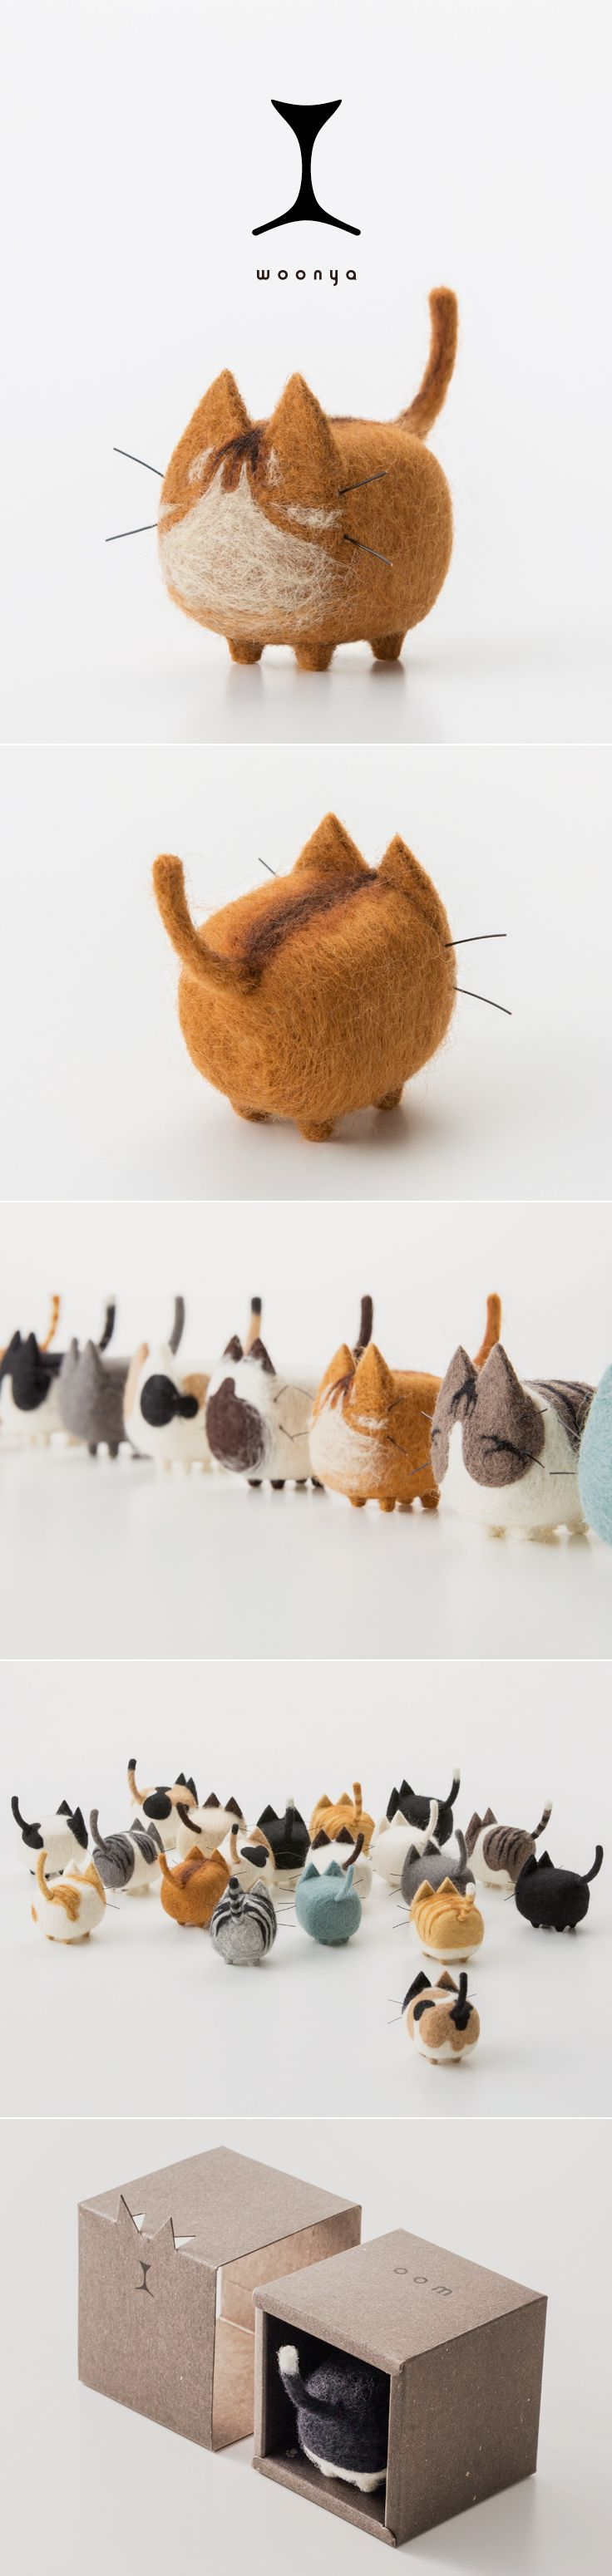 7391 best felt project images on Pinterest | Felted wool, Desserts ...